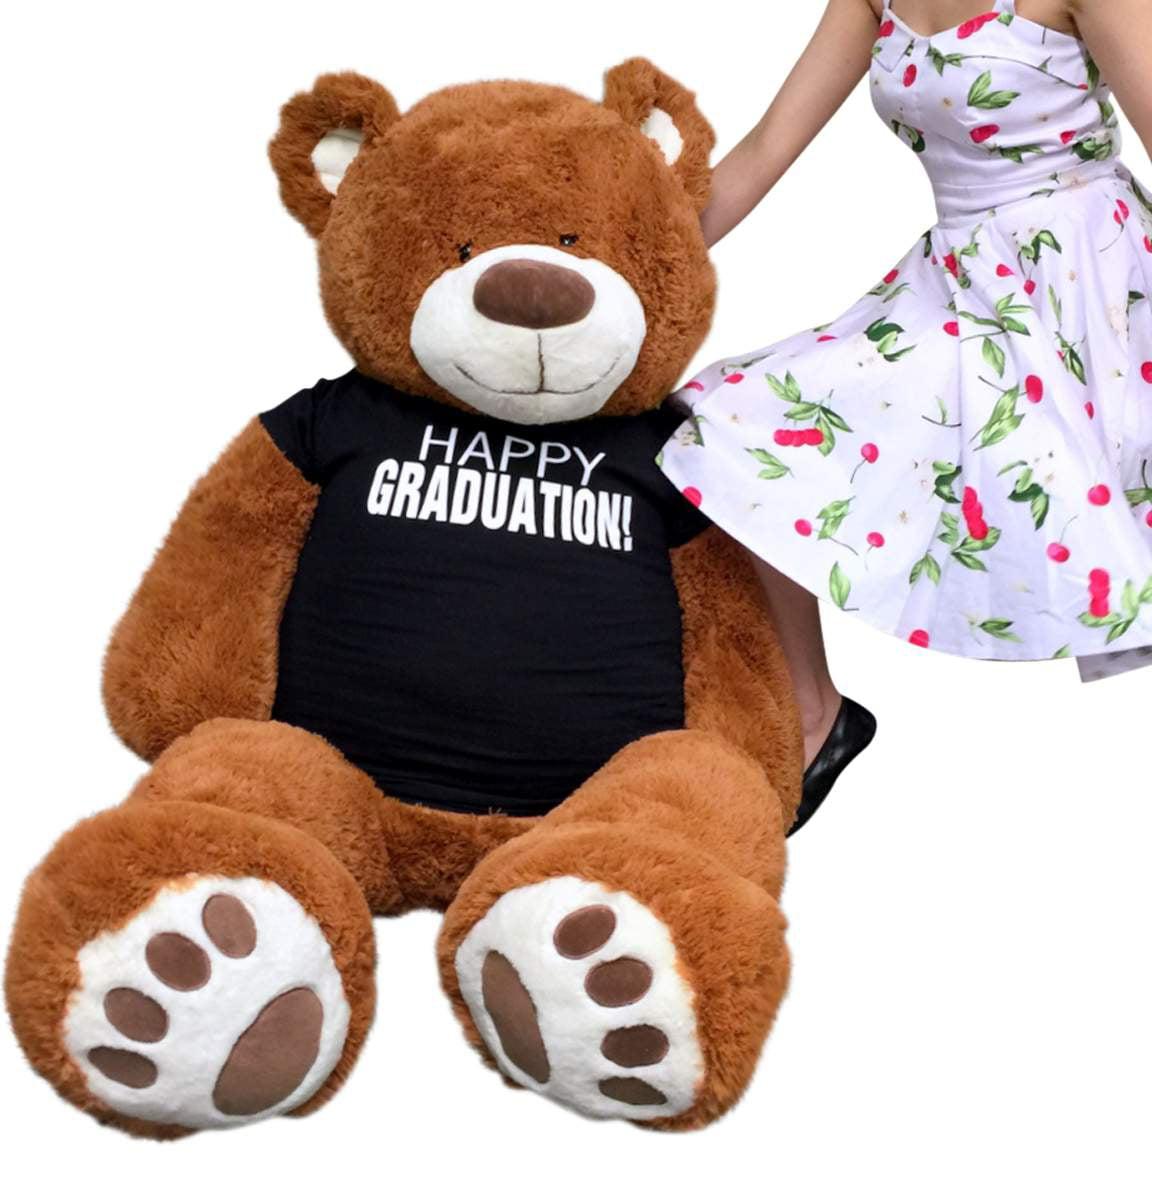 Big Plush 5 Foot Graduation Teddy Bear Soft, Cinnamon Color, T shirt says HAPPY GRADUATION by BigPlush